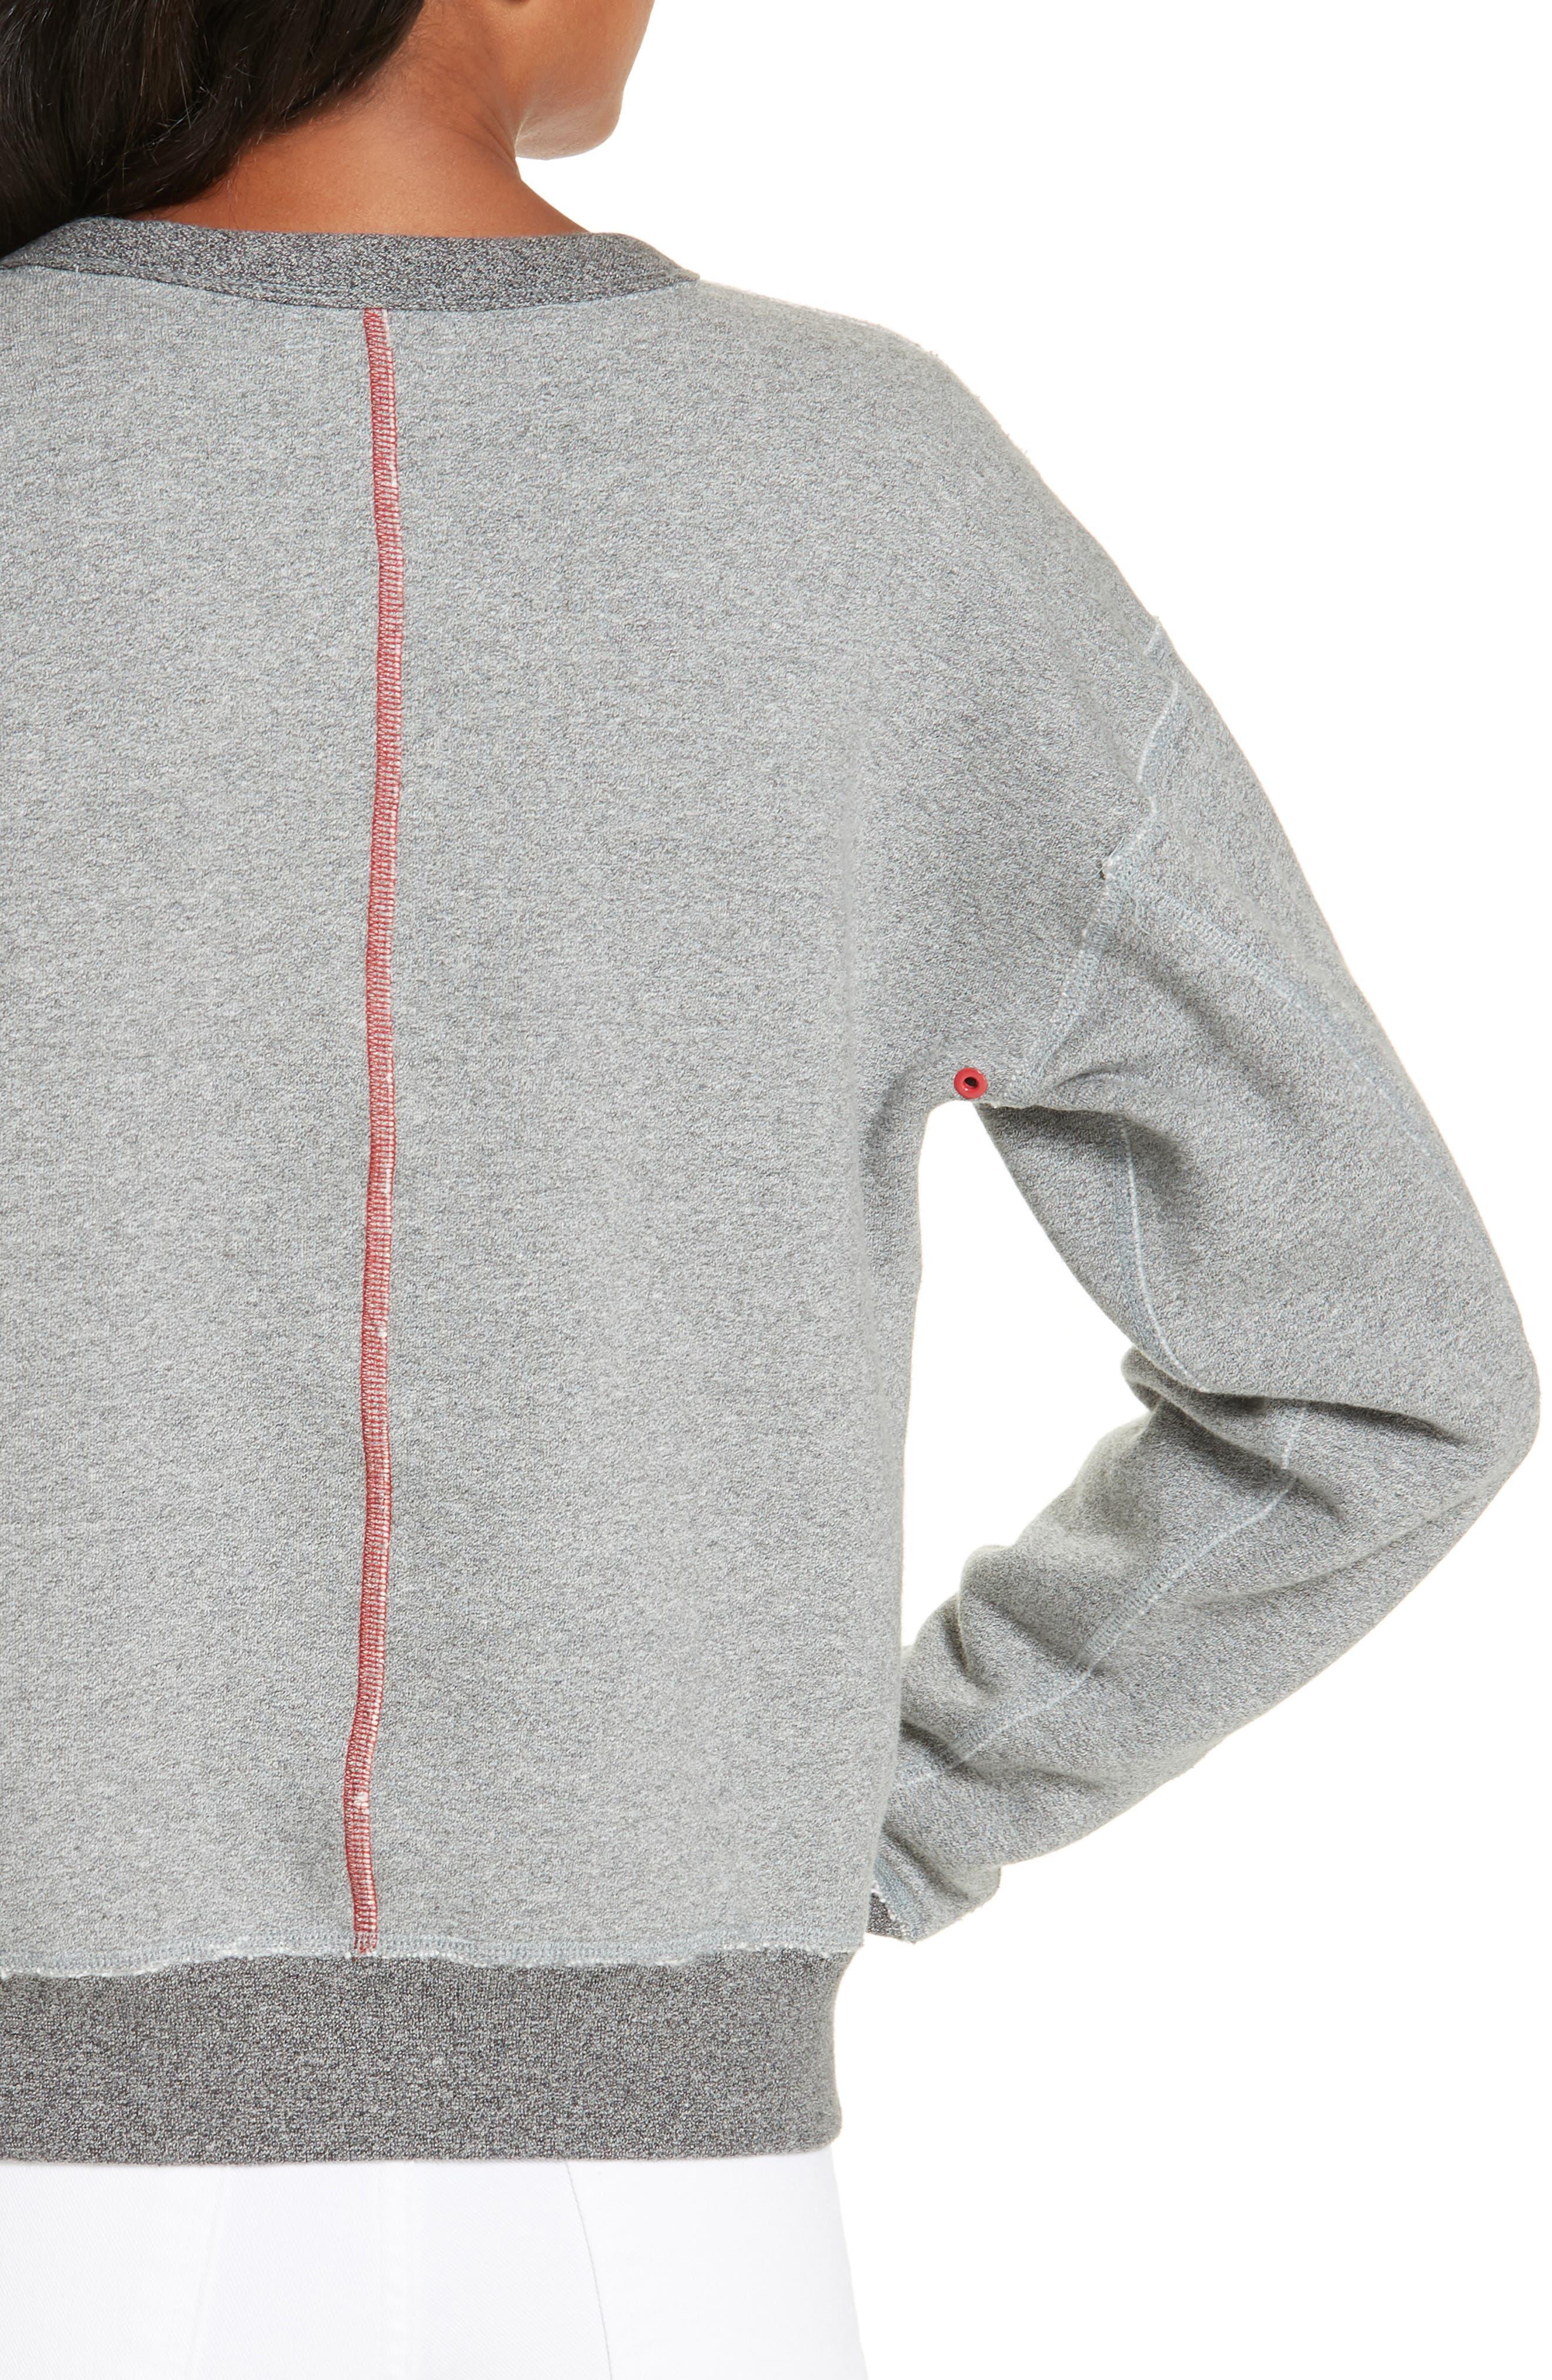 rag & bone Best Sweatshirt,                             Alternate thumbnail 4, color,                             HEATHER GREY